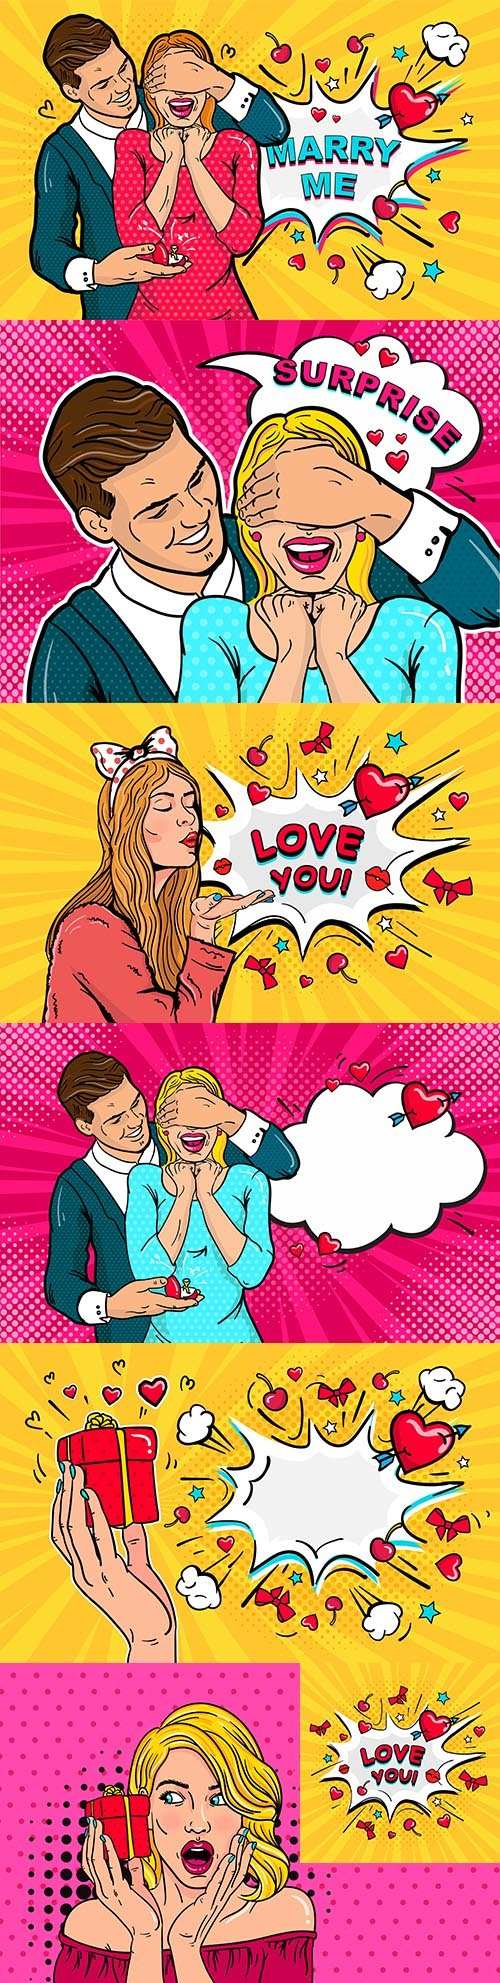 Happy couple in love illustration in pop art style